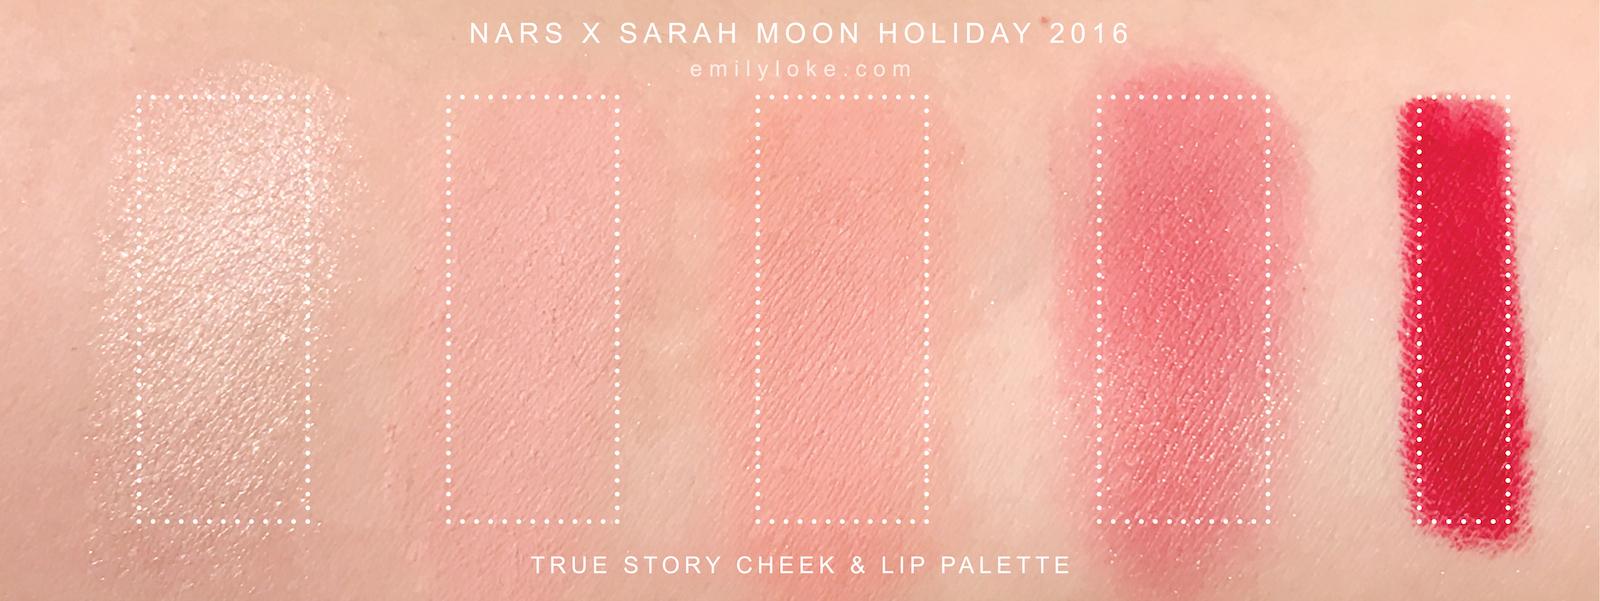 NARS x Sarah Moon swatches 2